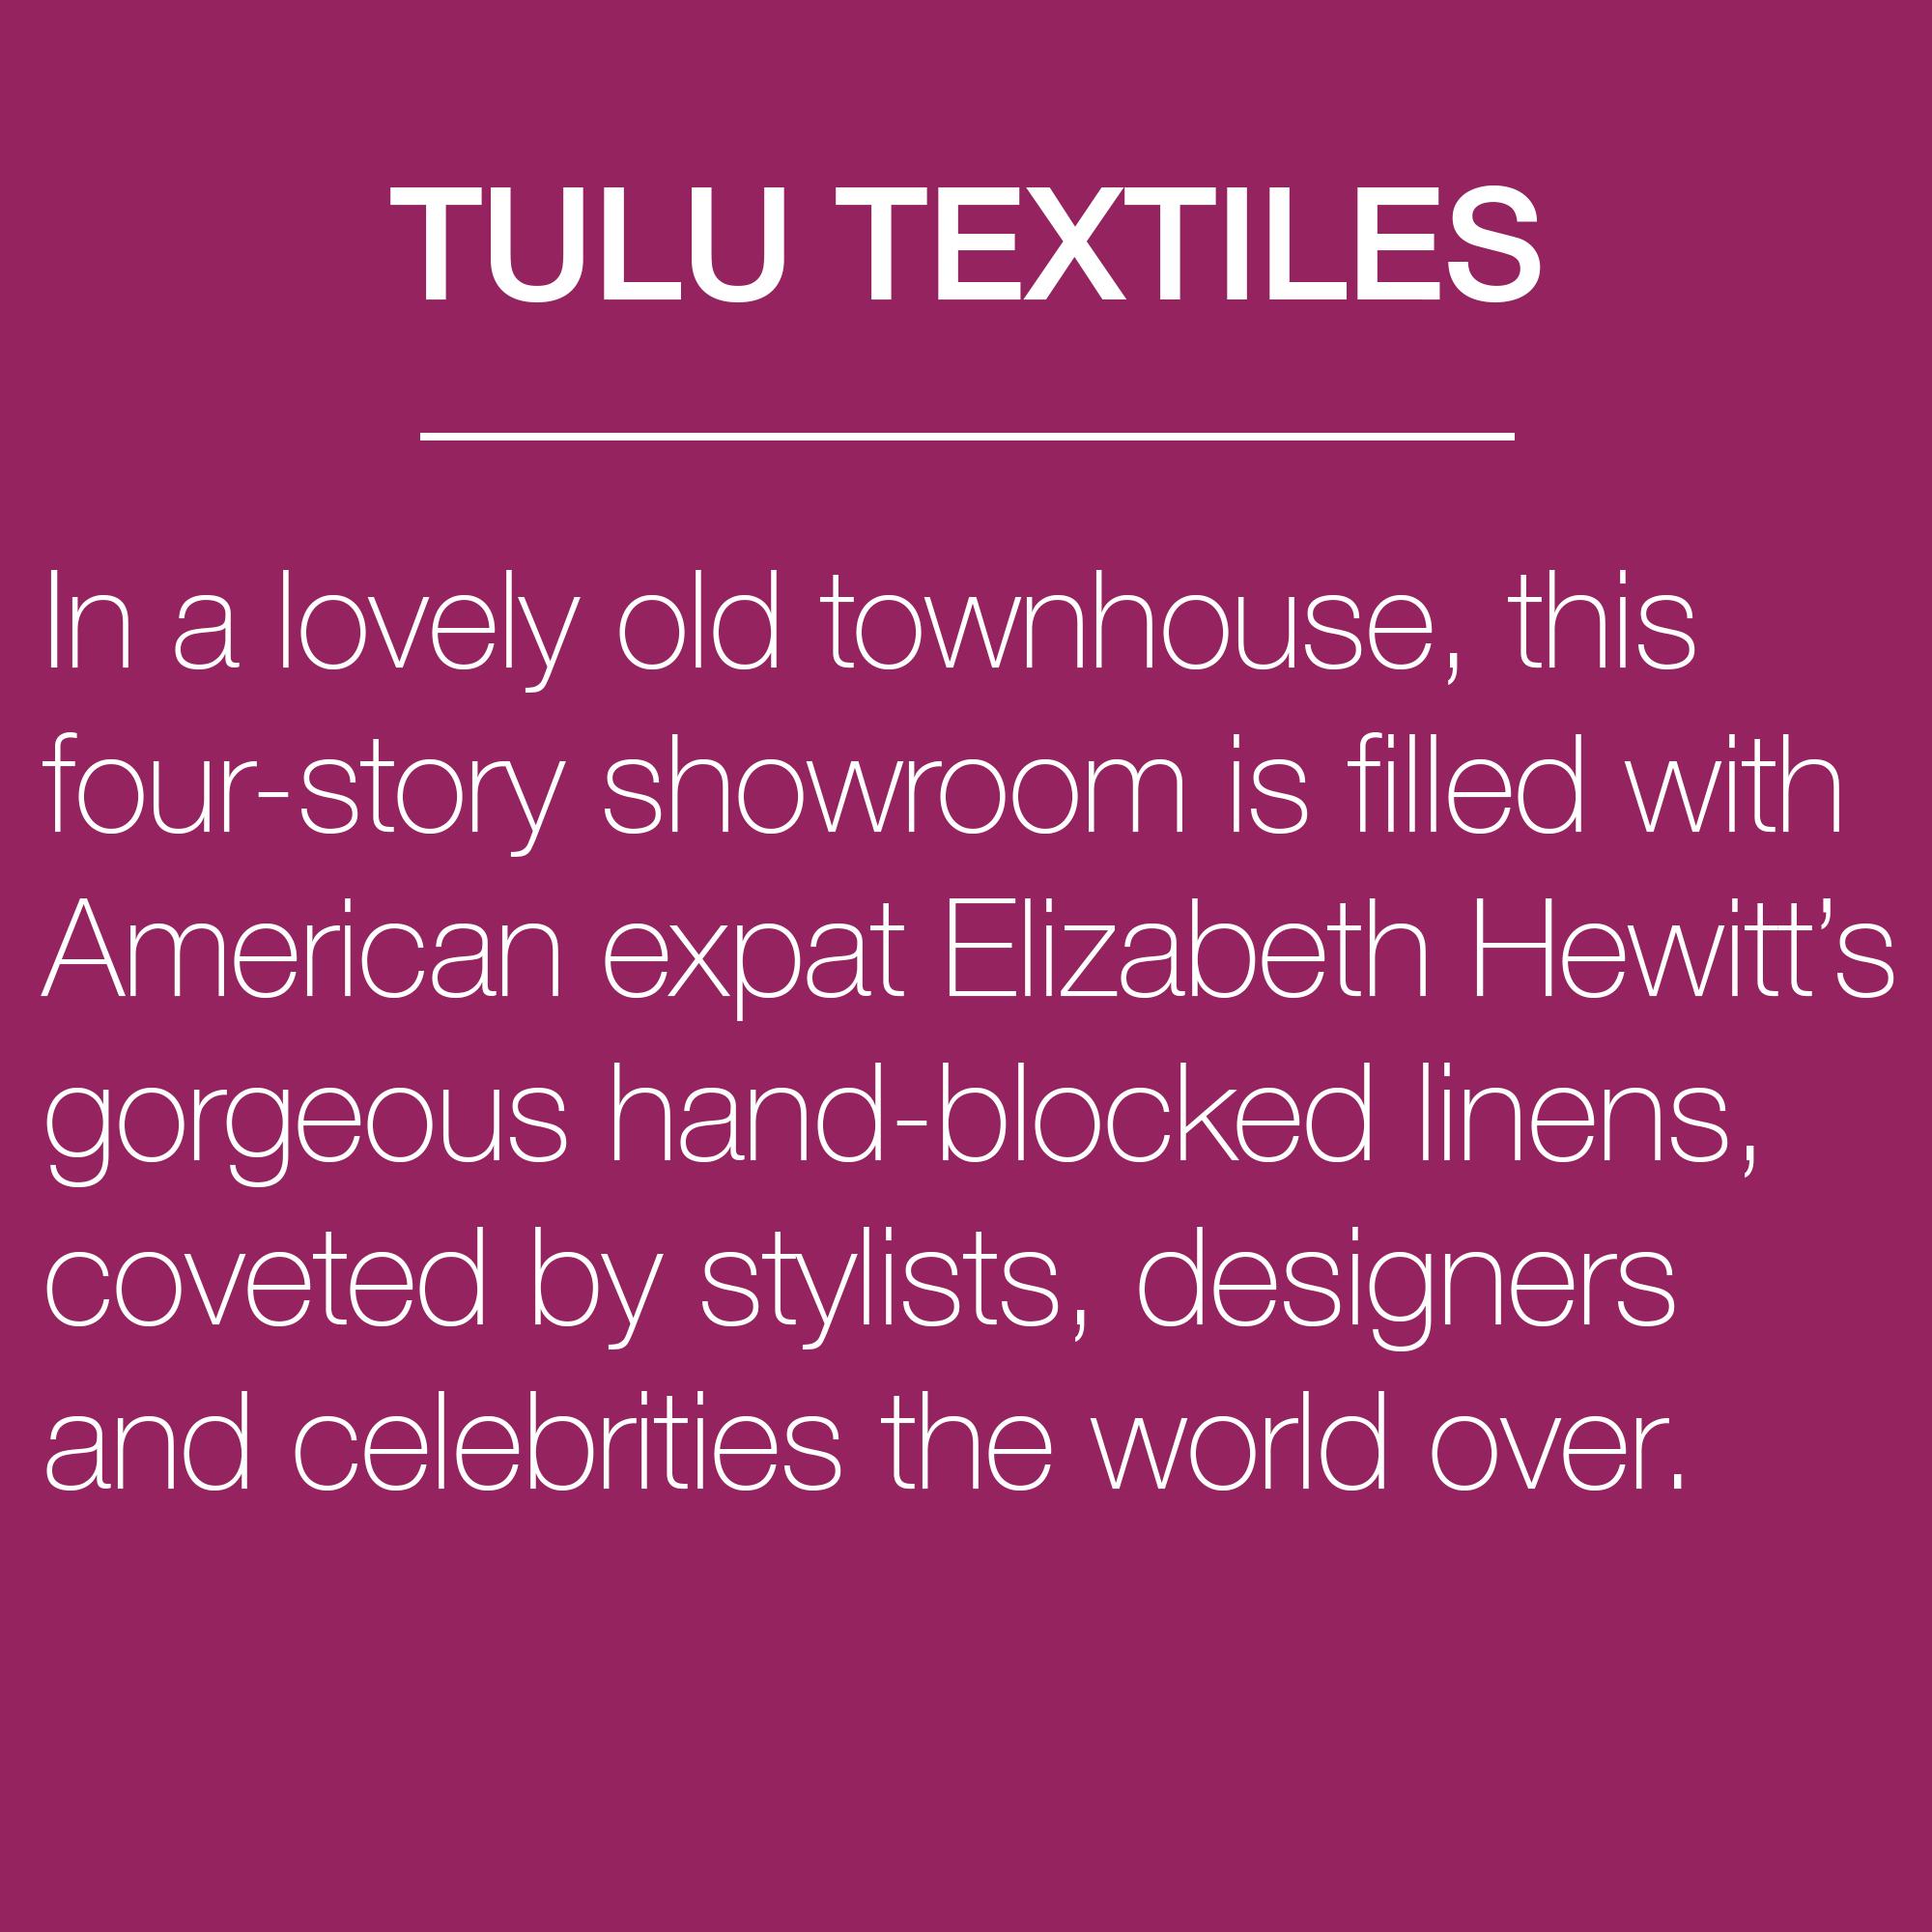 jason-b-graham-collaborations-OKL-tulu-textiles-square